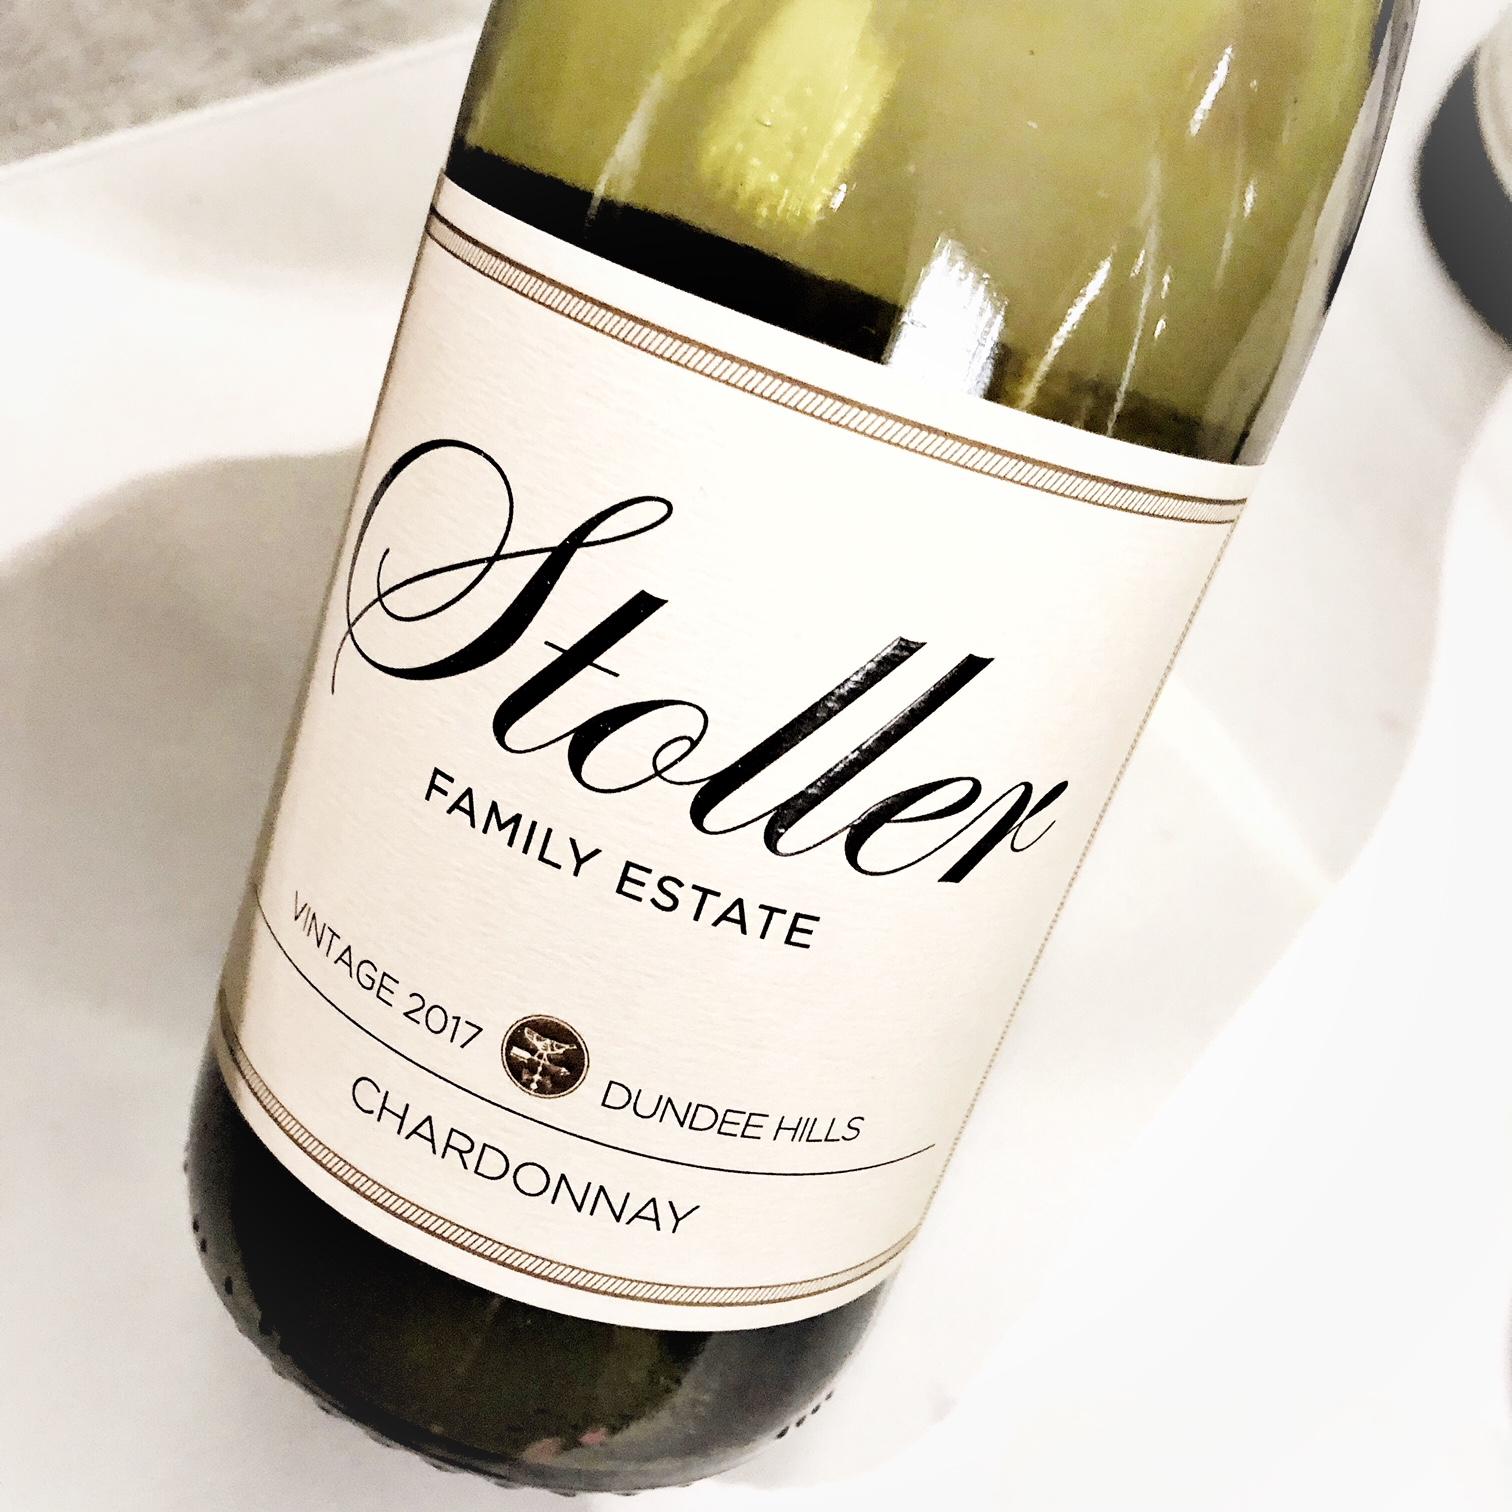 Stoller Chardonnay